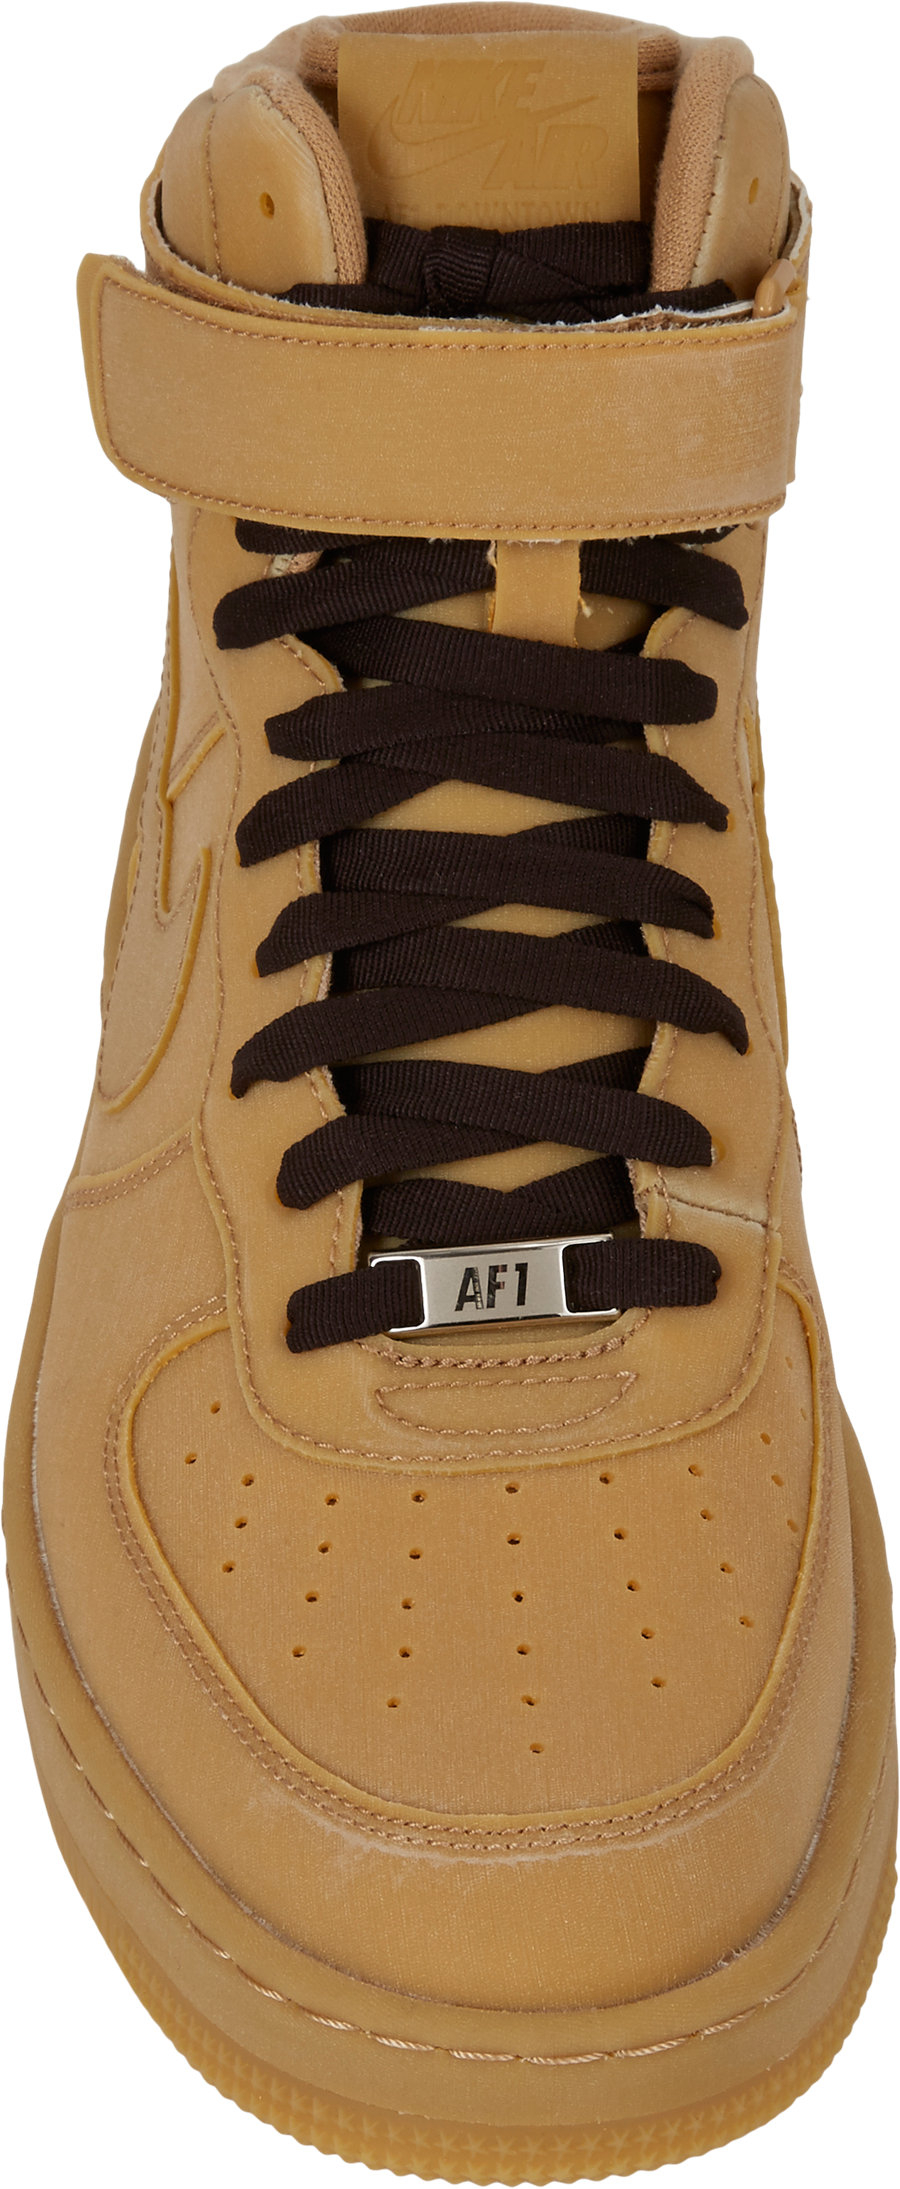 Lyst Nike Air Force 1 Downtown Hi Gum Hightop Sneakers